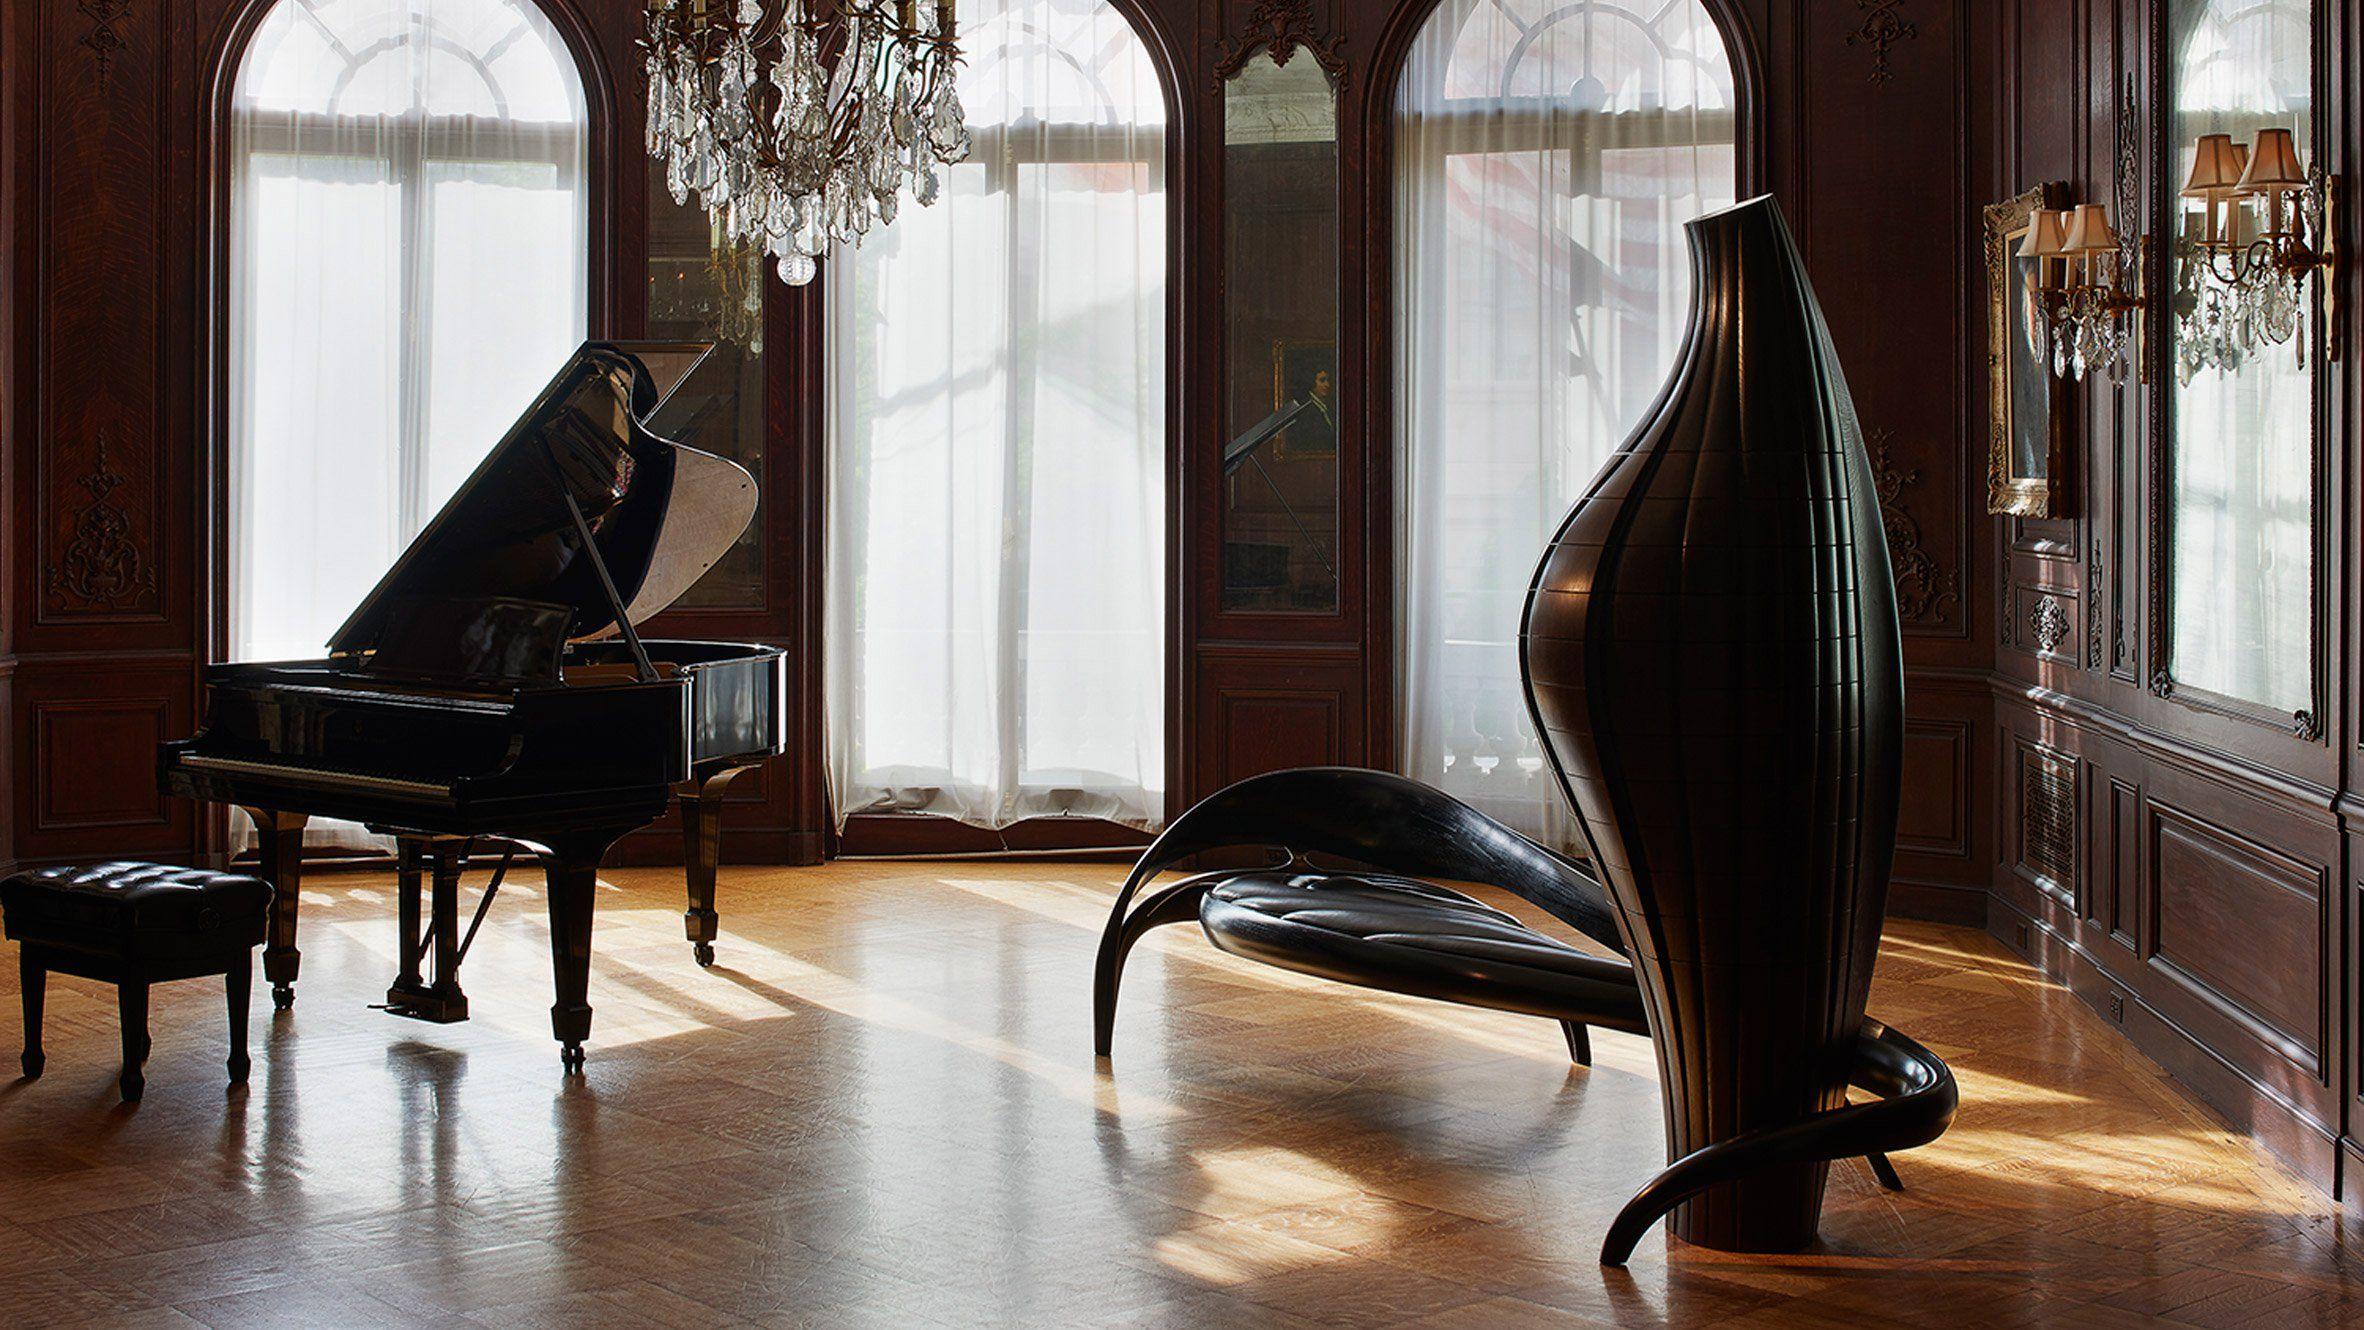 irish furniture workshop joseph walsh studio has showcased new rh pinterest co uk